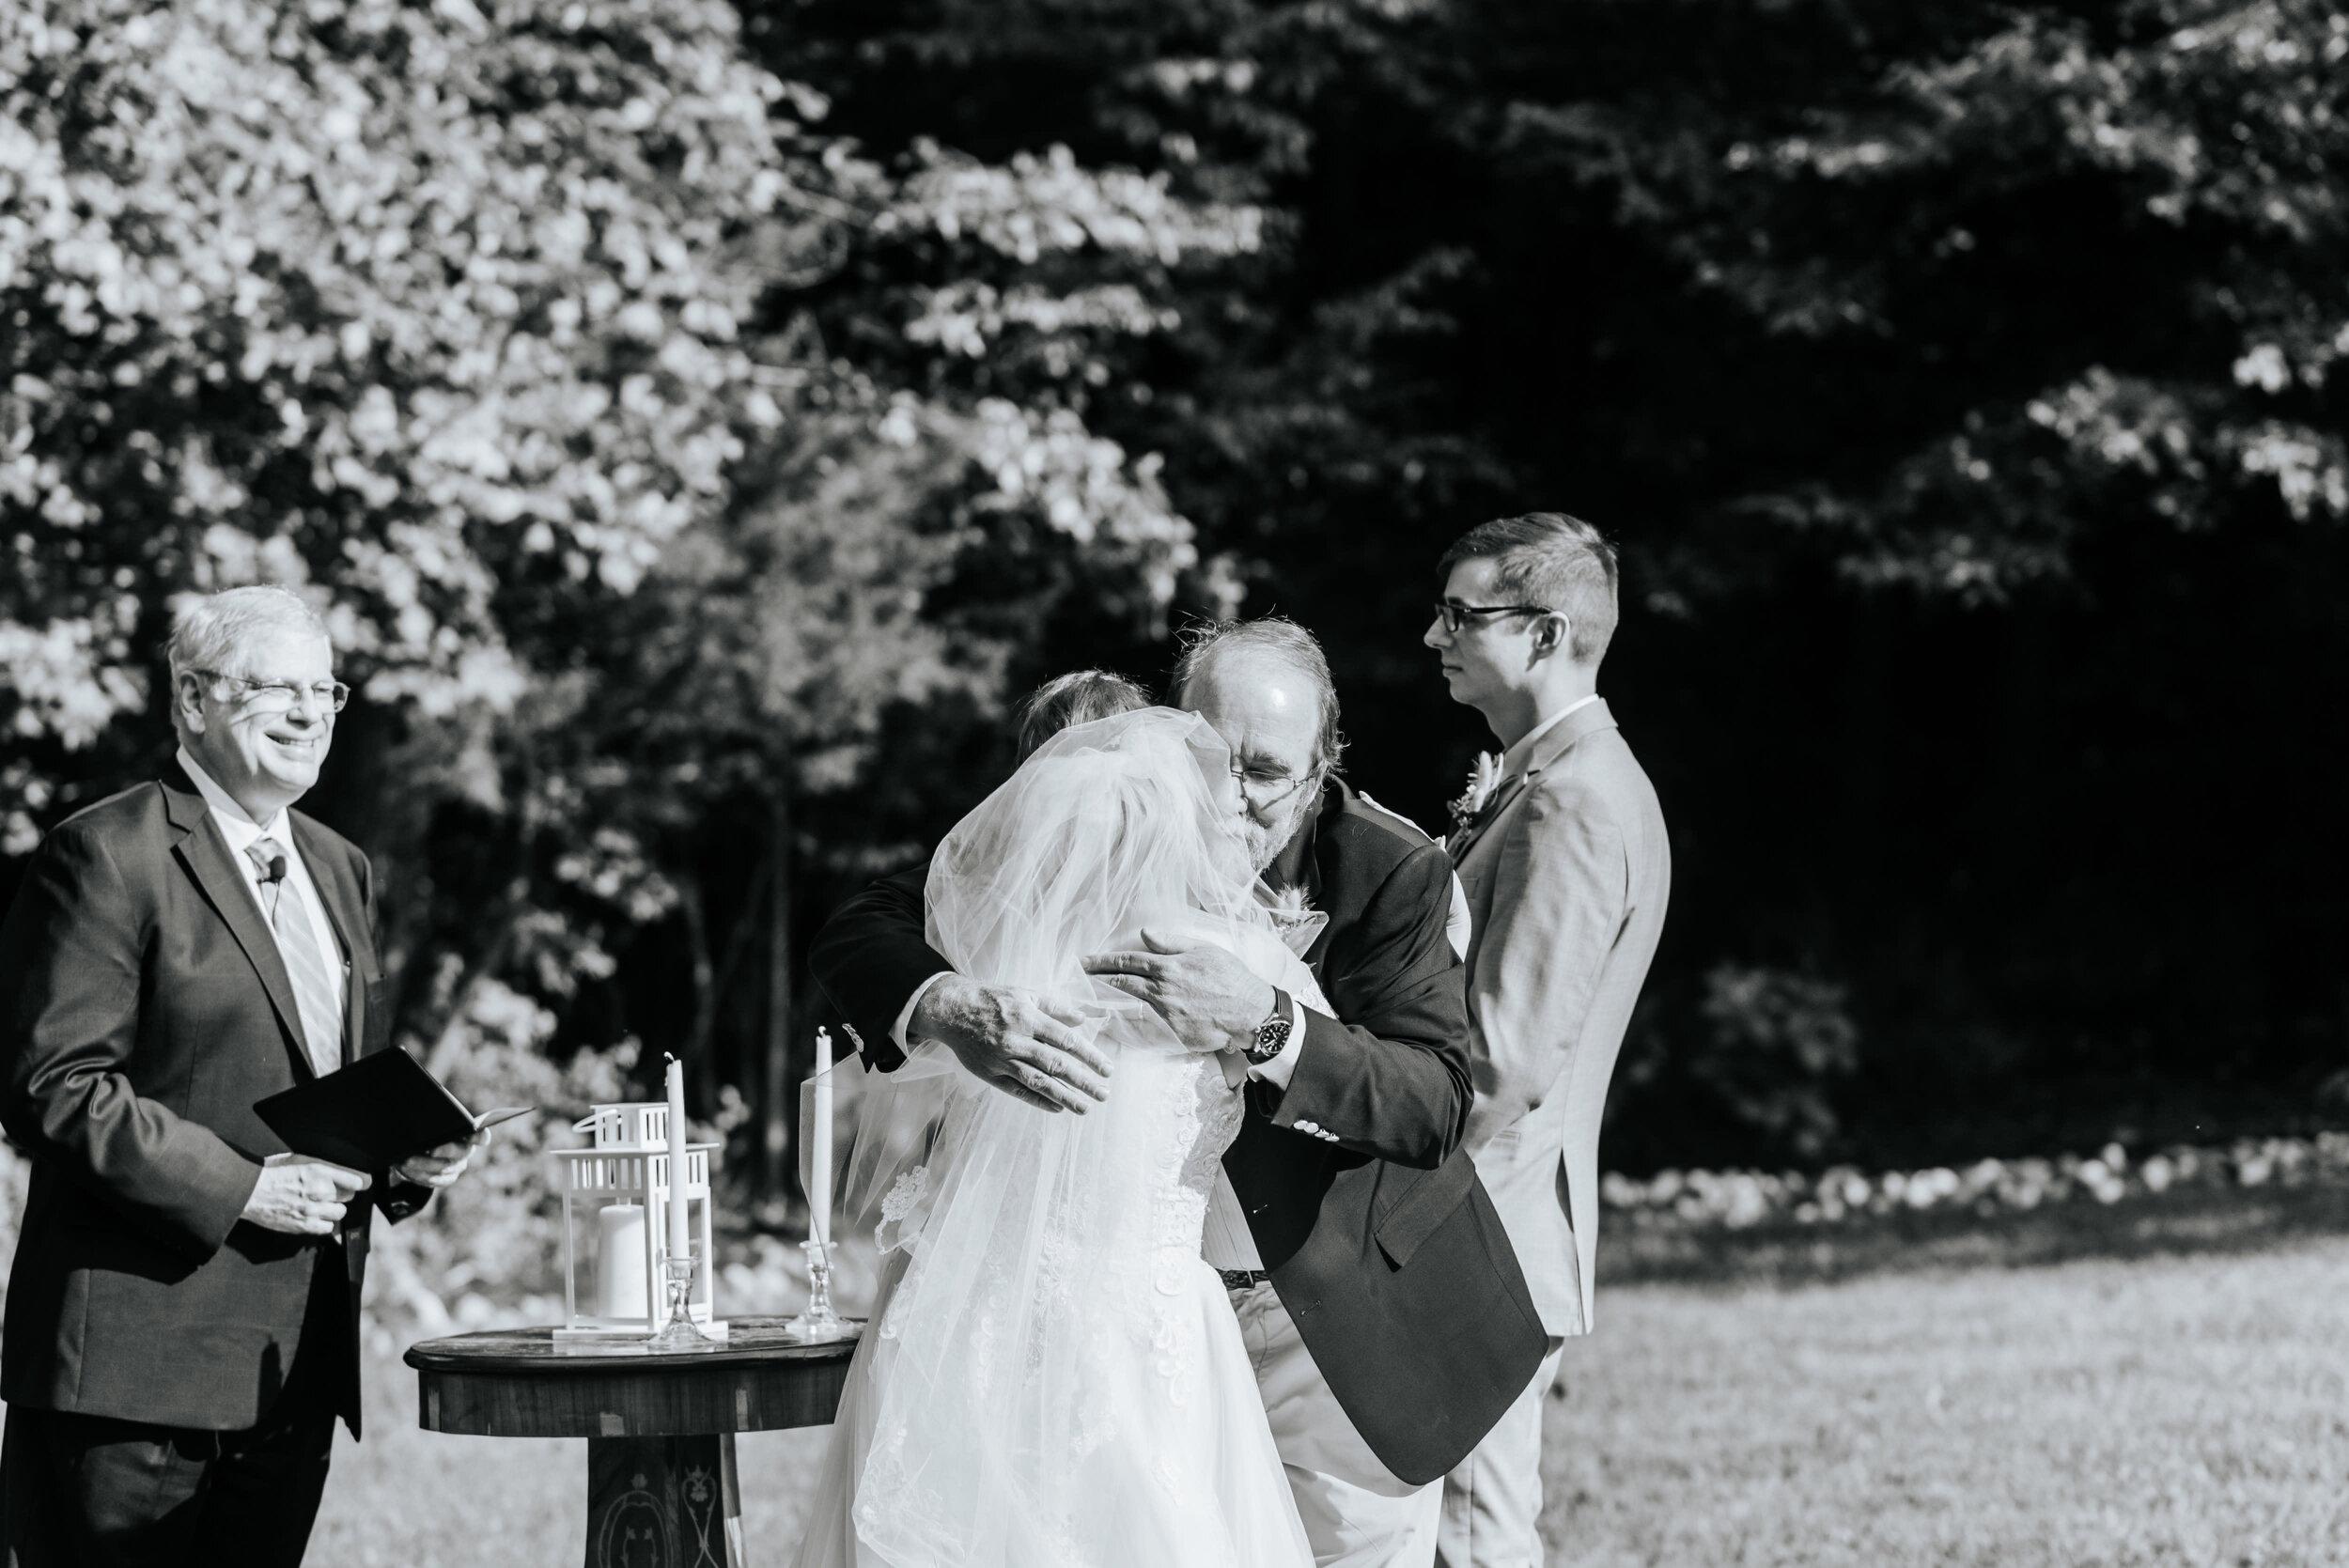 Rachel_David_Wedding_Richmond_Virginia_Photography_by_V_22.jpg